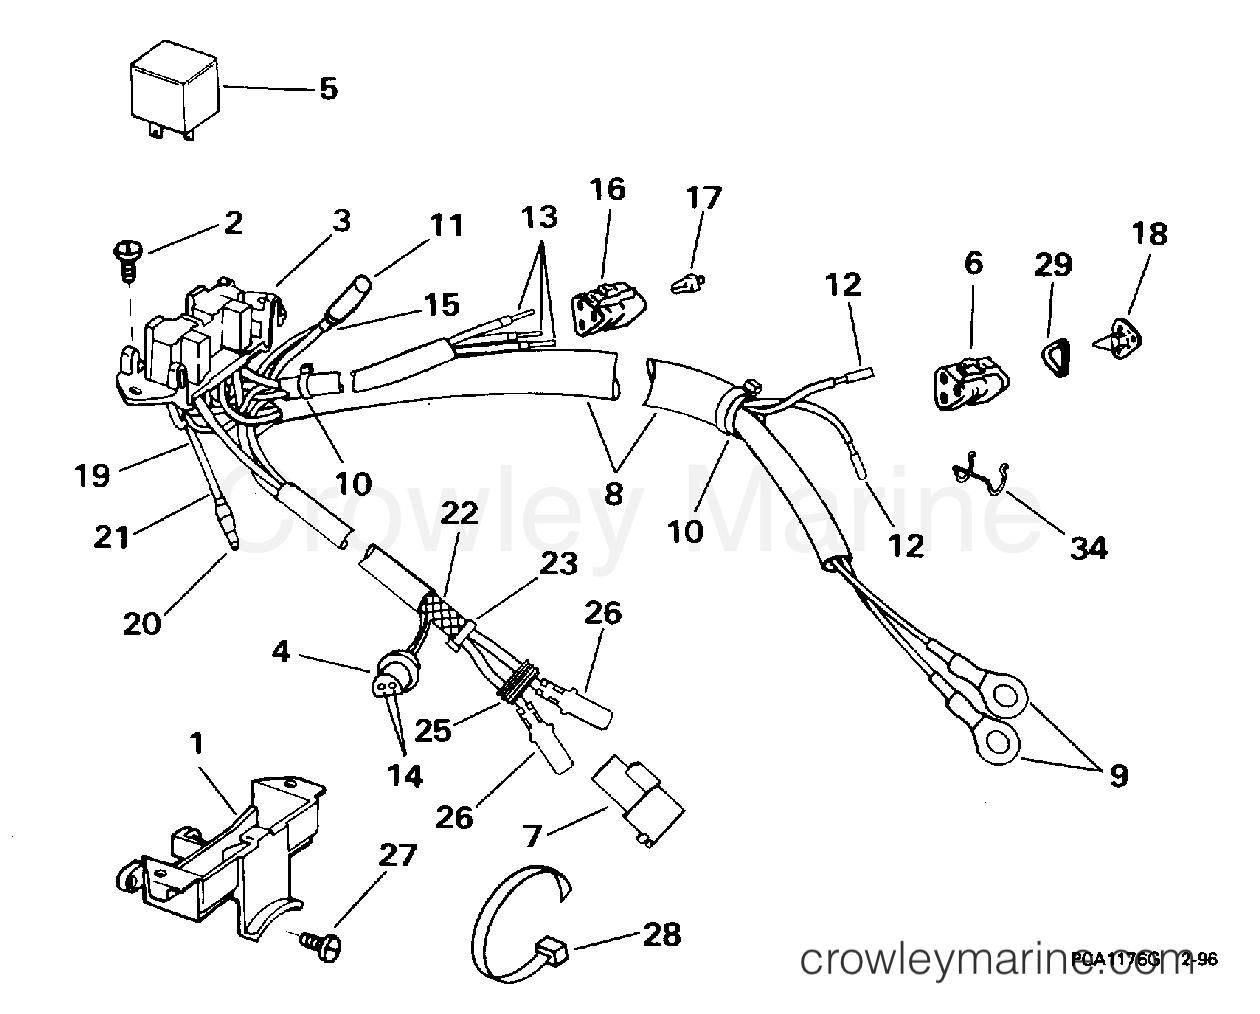 1996 Johnson 115 Outboard Manual